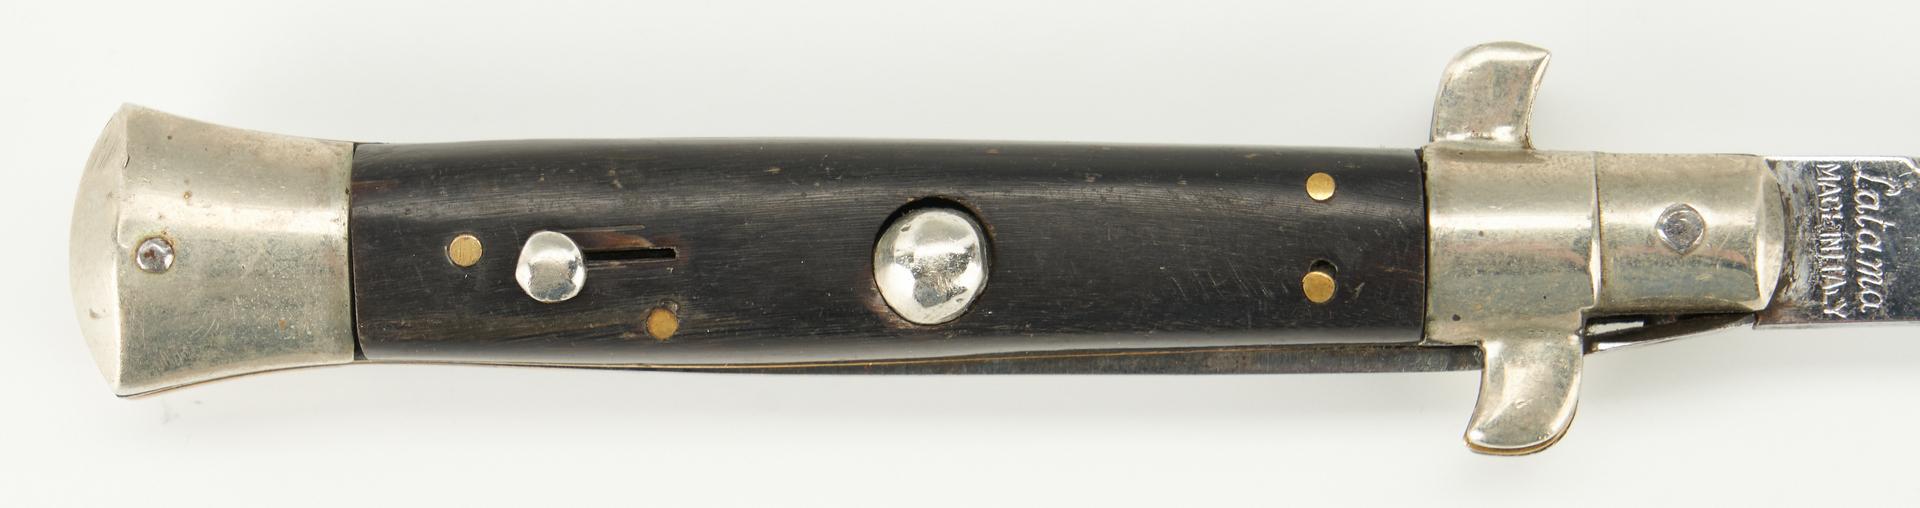 Lot 694: Latama Cutlery Italian Picklock Switchblade